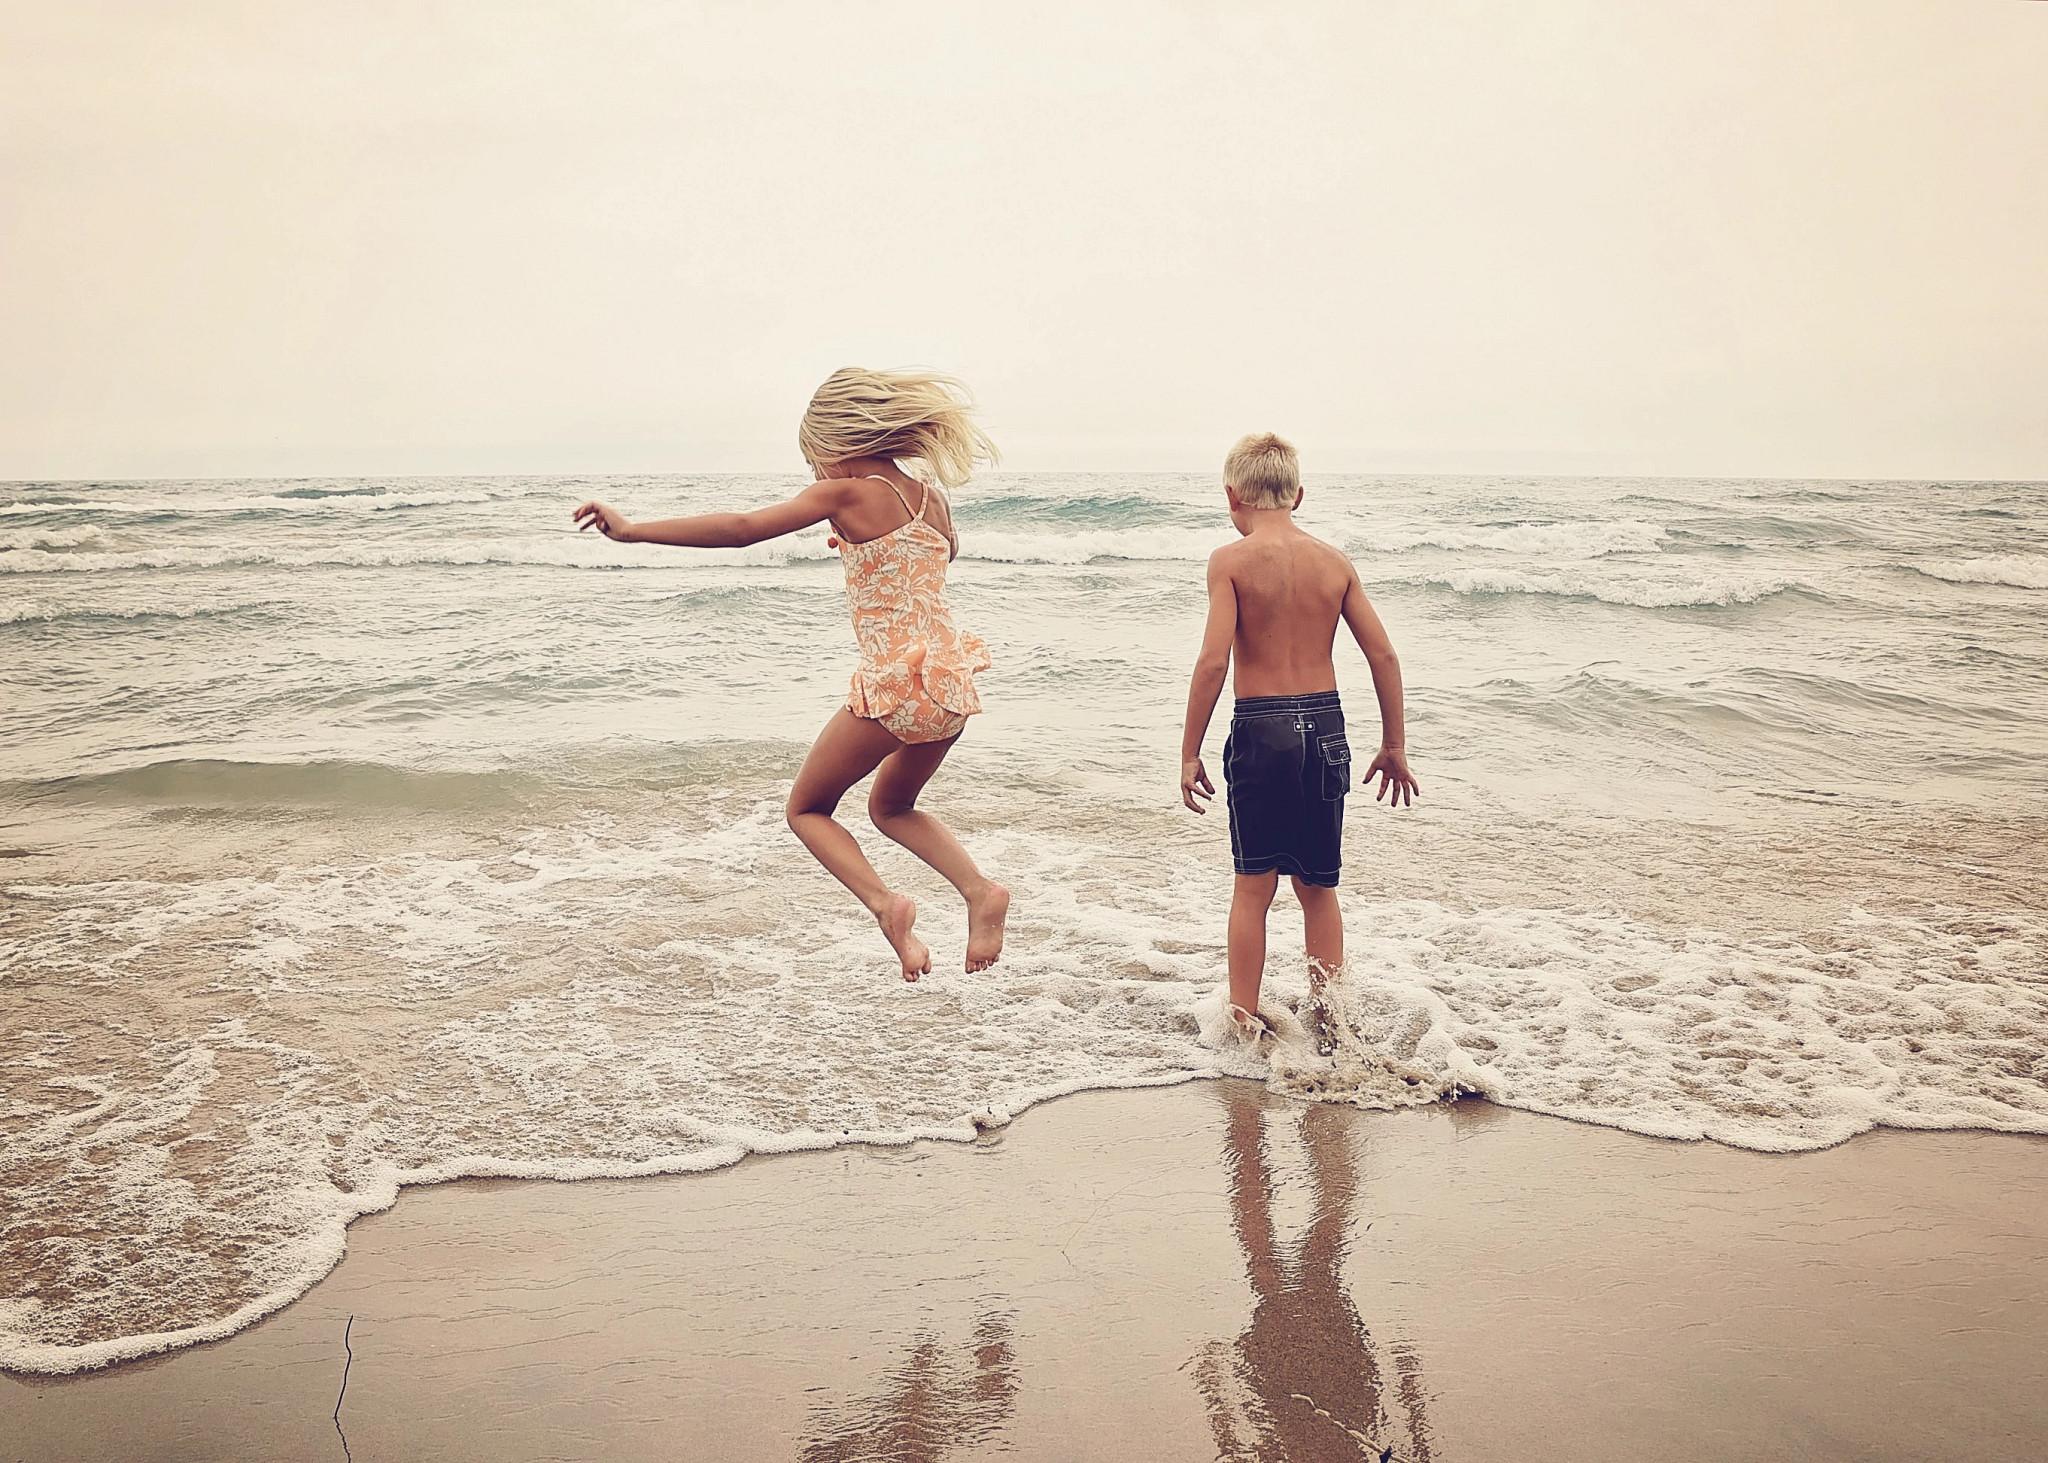 little boy and little girl splashing in waves on sandy beach